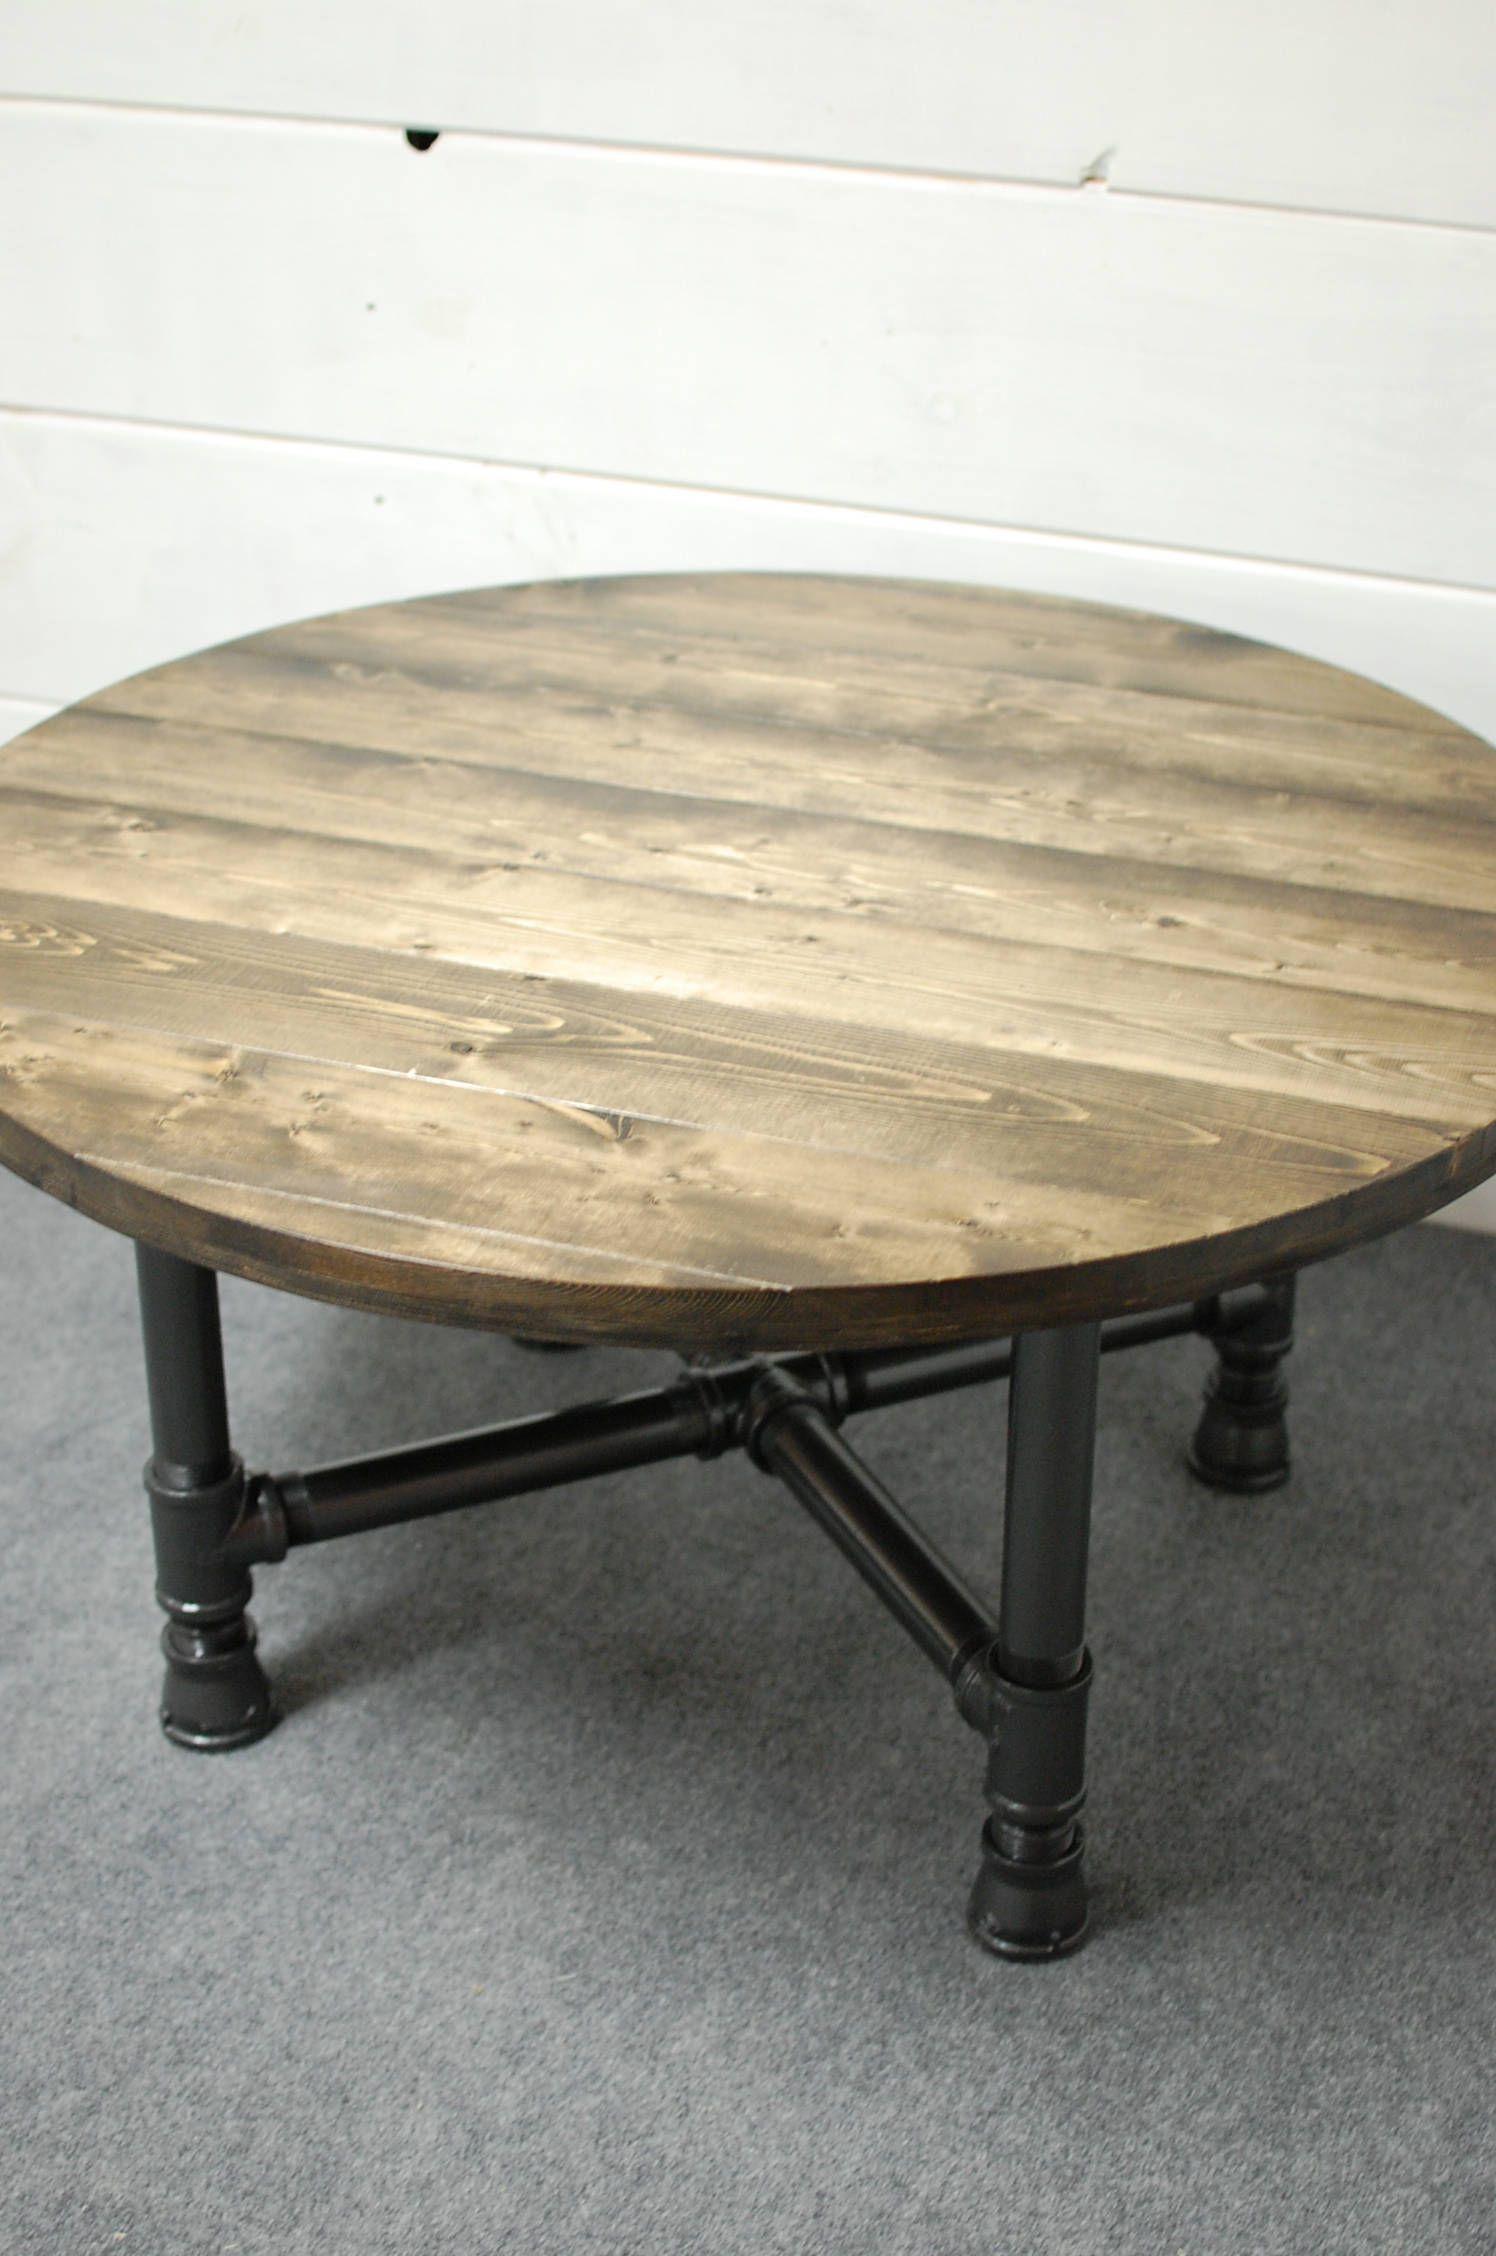 industrial furniture hardware. Reclaimed Wood Furniture, Industrial Coffee Tables, Rustic Table, Pipe Sizes, Pipes, Hardware, Rounding Furniture Hardware -